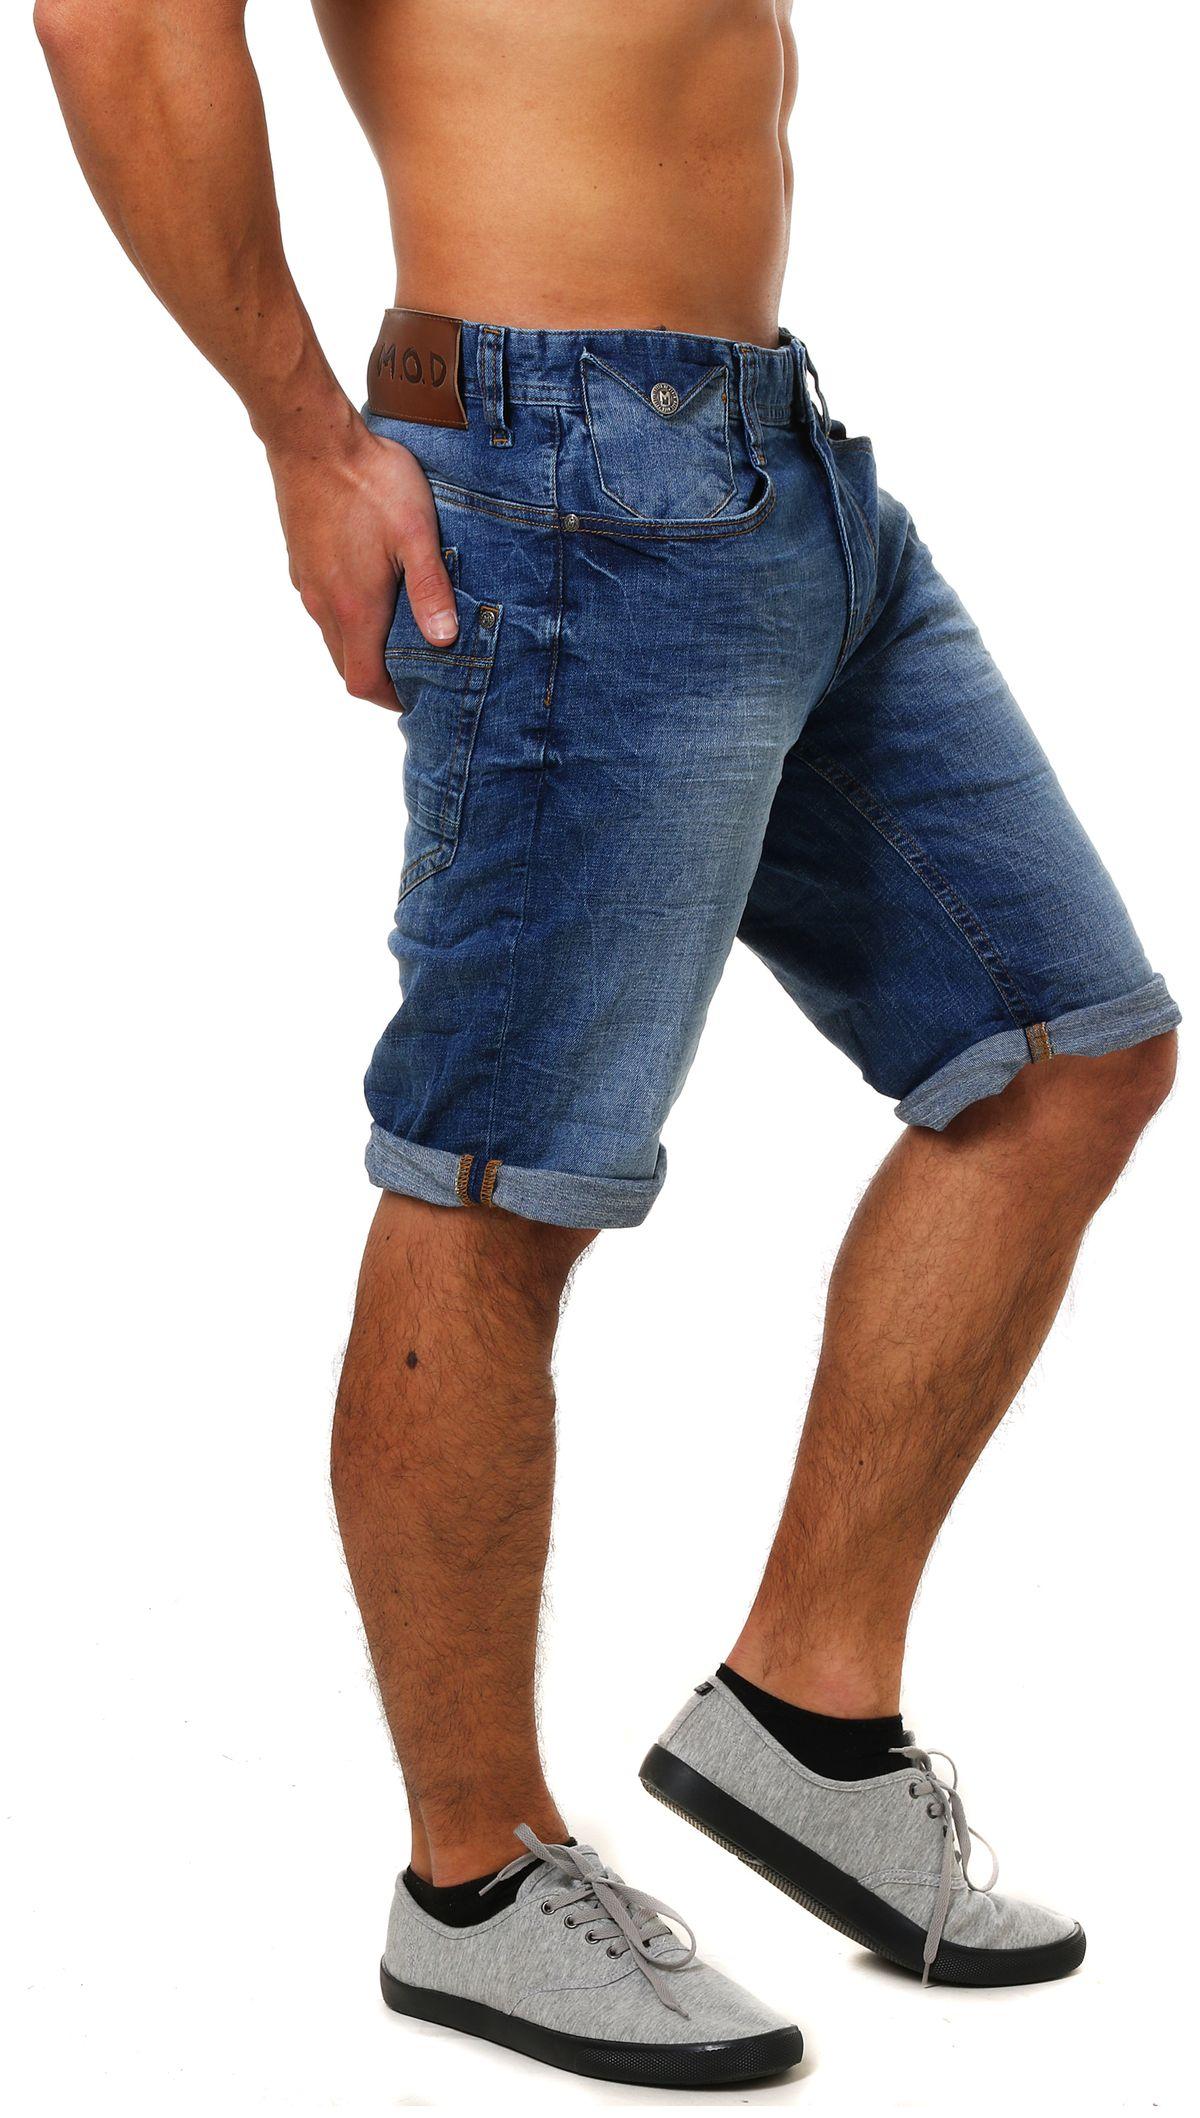 M.O.D Herren Jeans Shorts Joshua kurze Hose Bermuda MOD buffallo blue  sweatpants a0774118e4